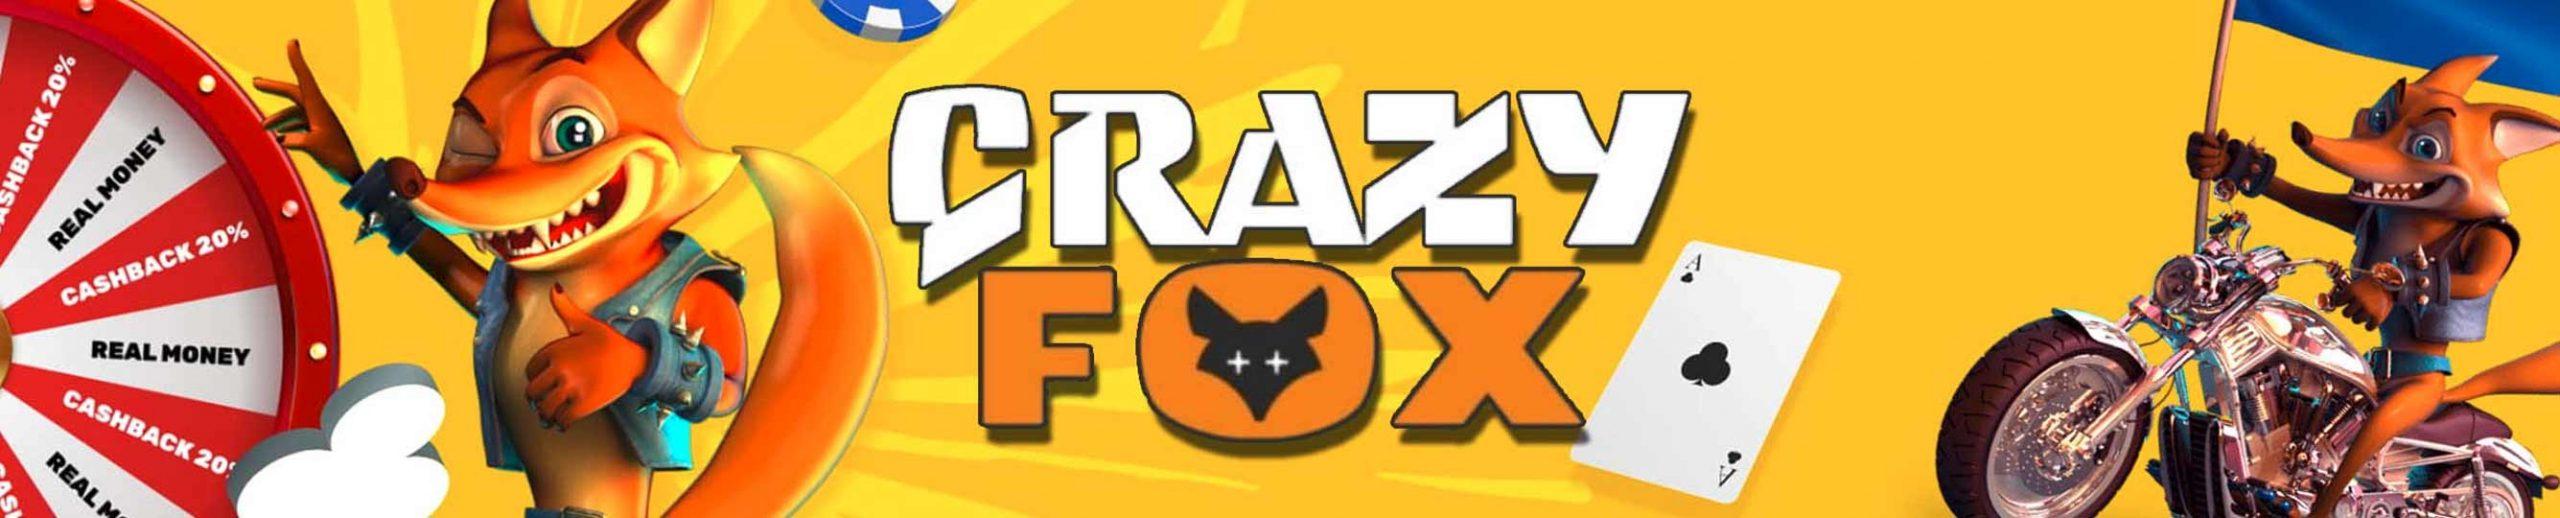 Crazy-Fox